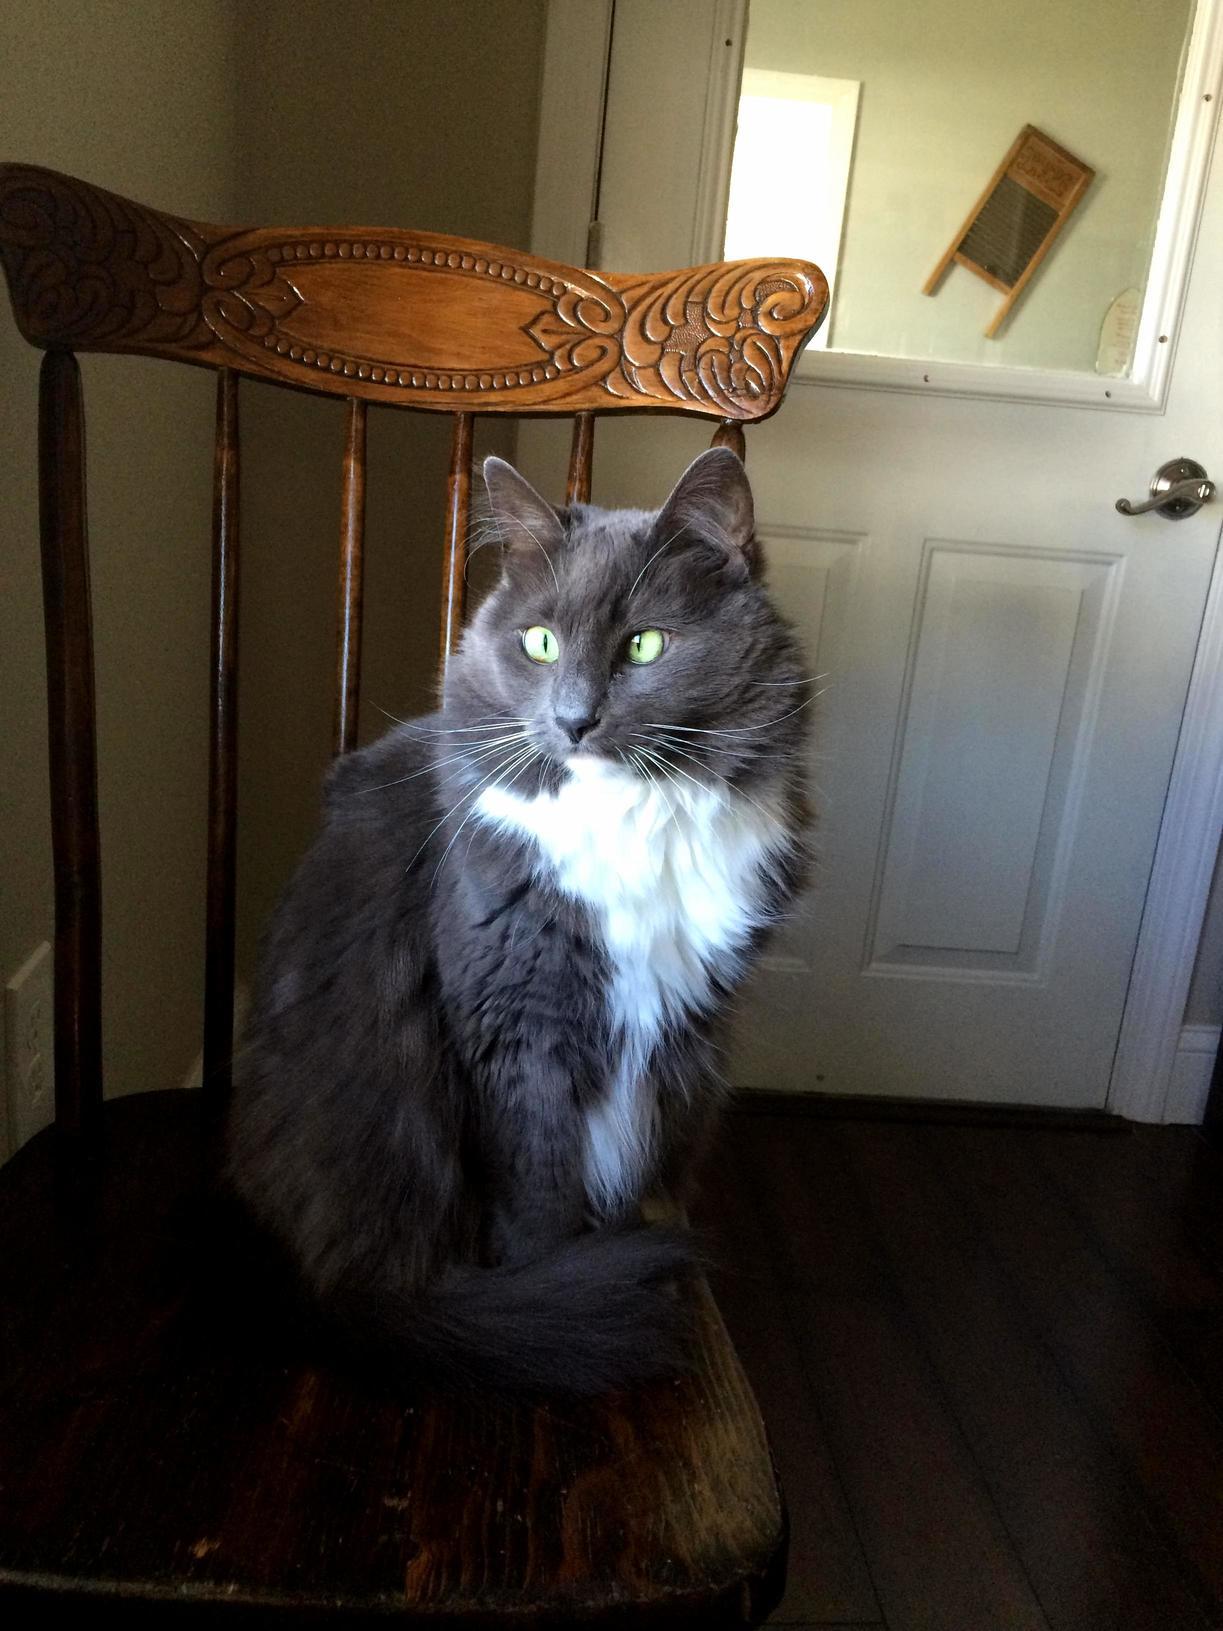 My fluffy grey cross-eyed model